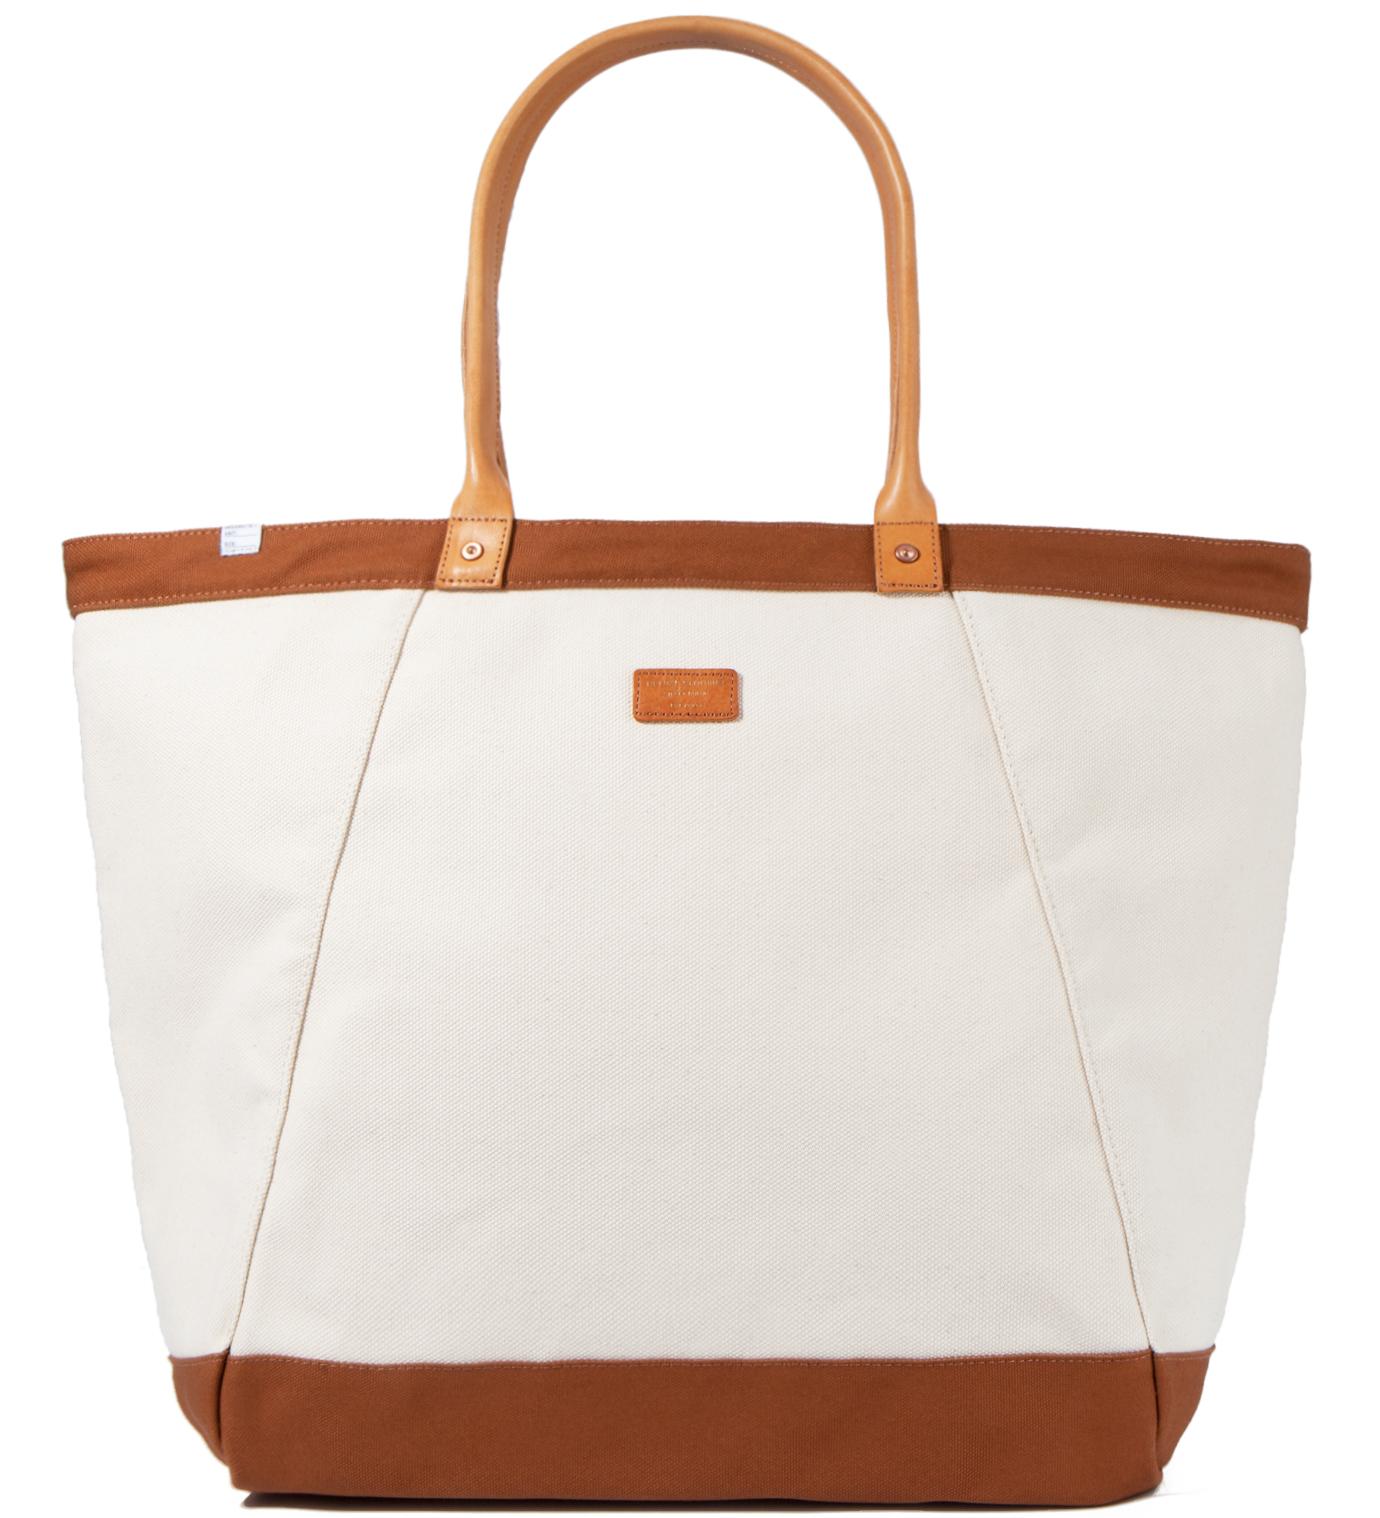 DELUXE White Wagon Tote Bag